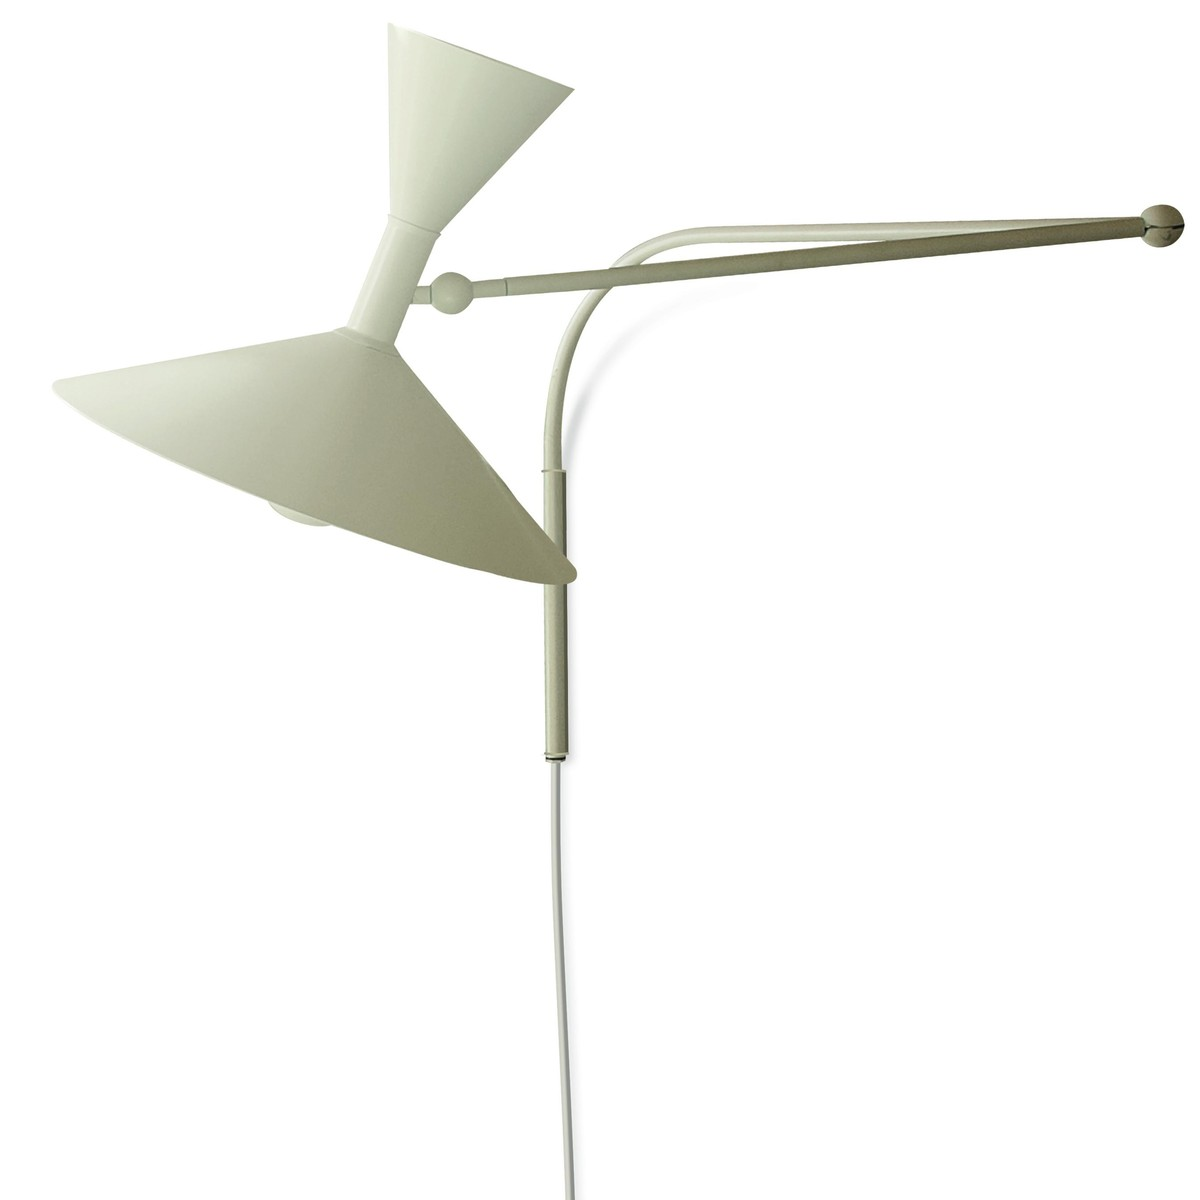 lampe de marseille wall lamp nemo. Black Bedroom Furniture Sets. Home Design Ideas